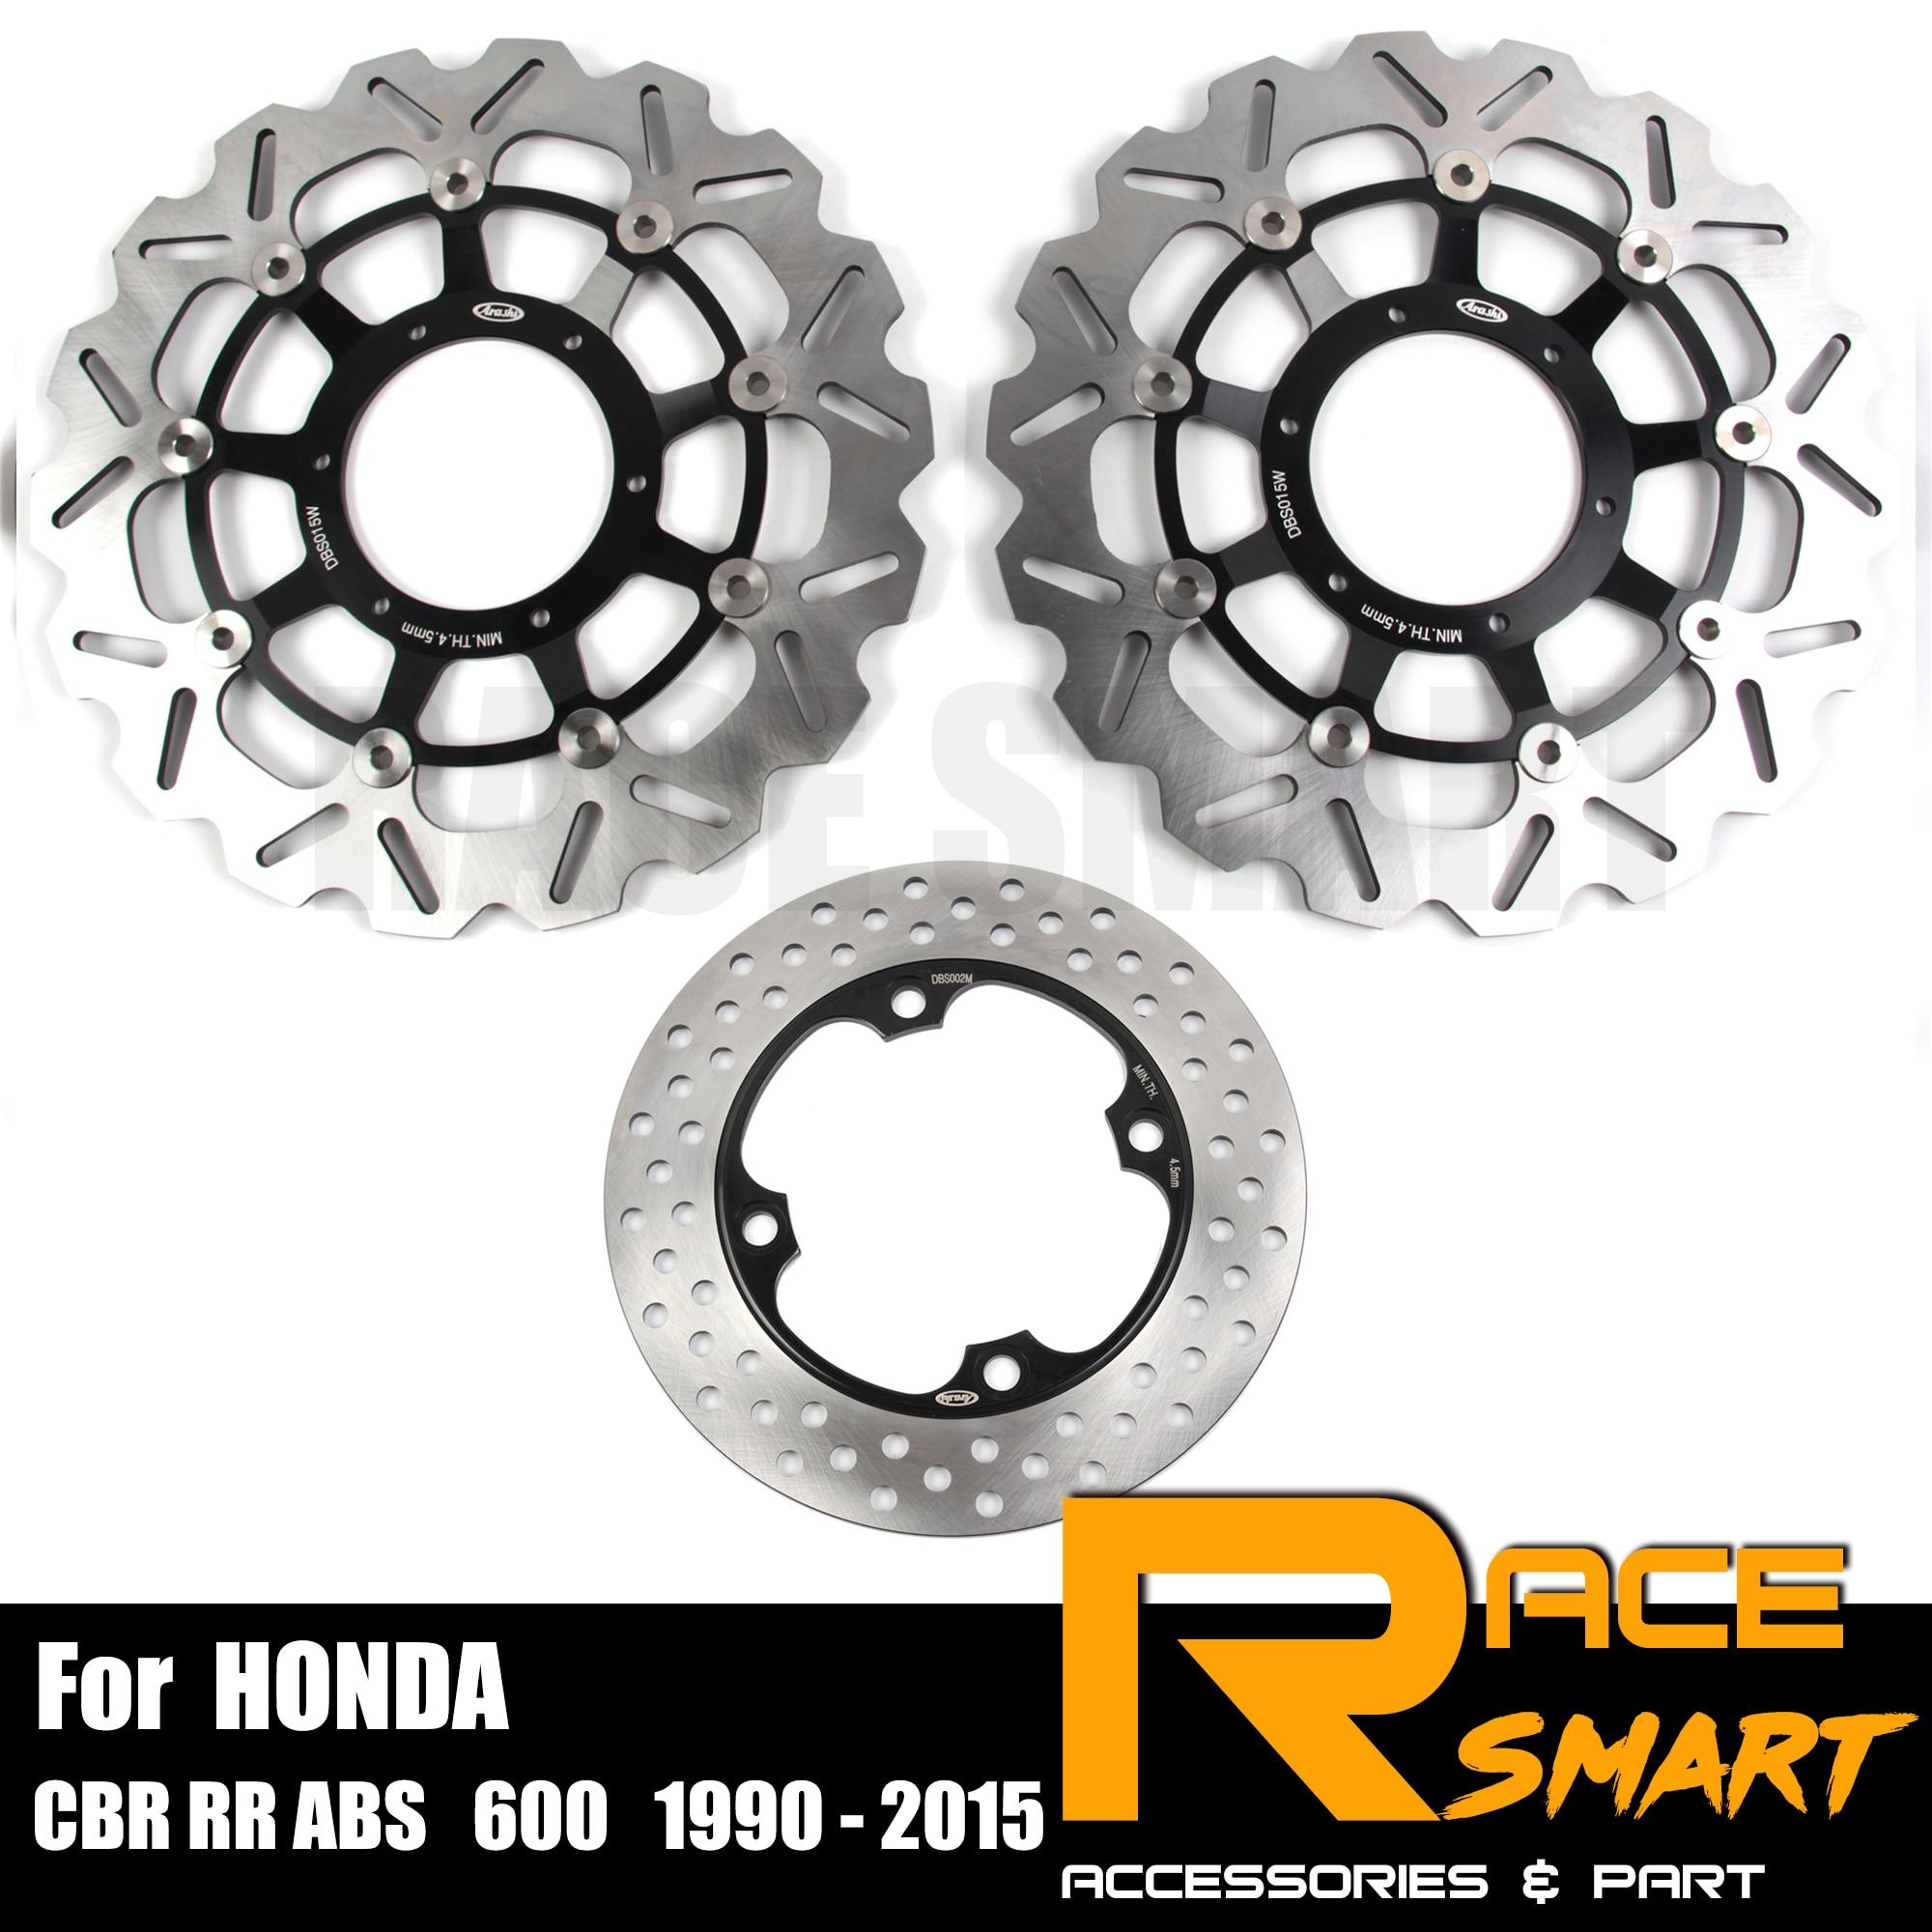 Rear Brake Disc Rotor For HONDA CBR600RR 2003-2015 CBR 600 RR ABS 2009-2015